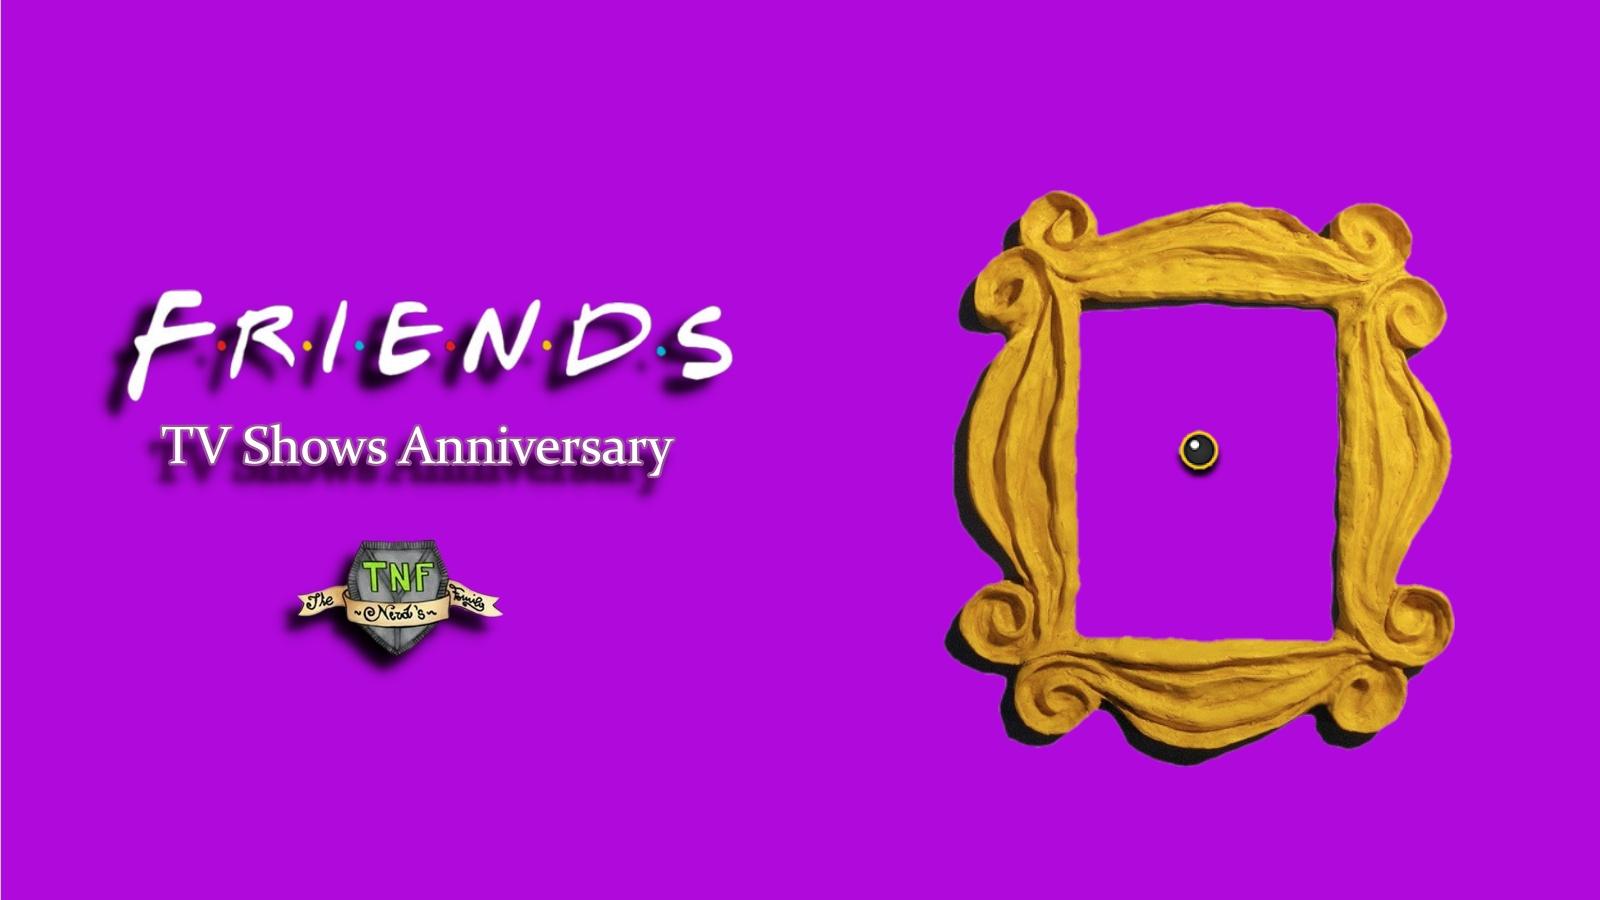 friends _tvshowsanniversary